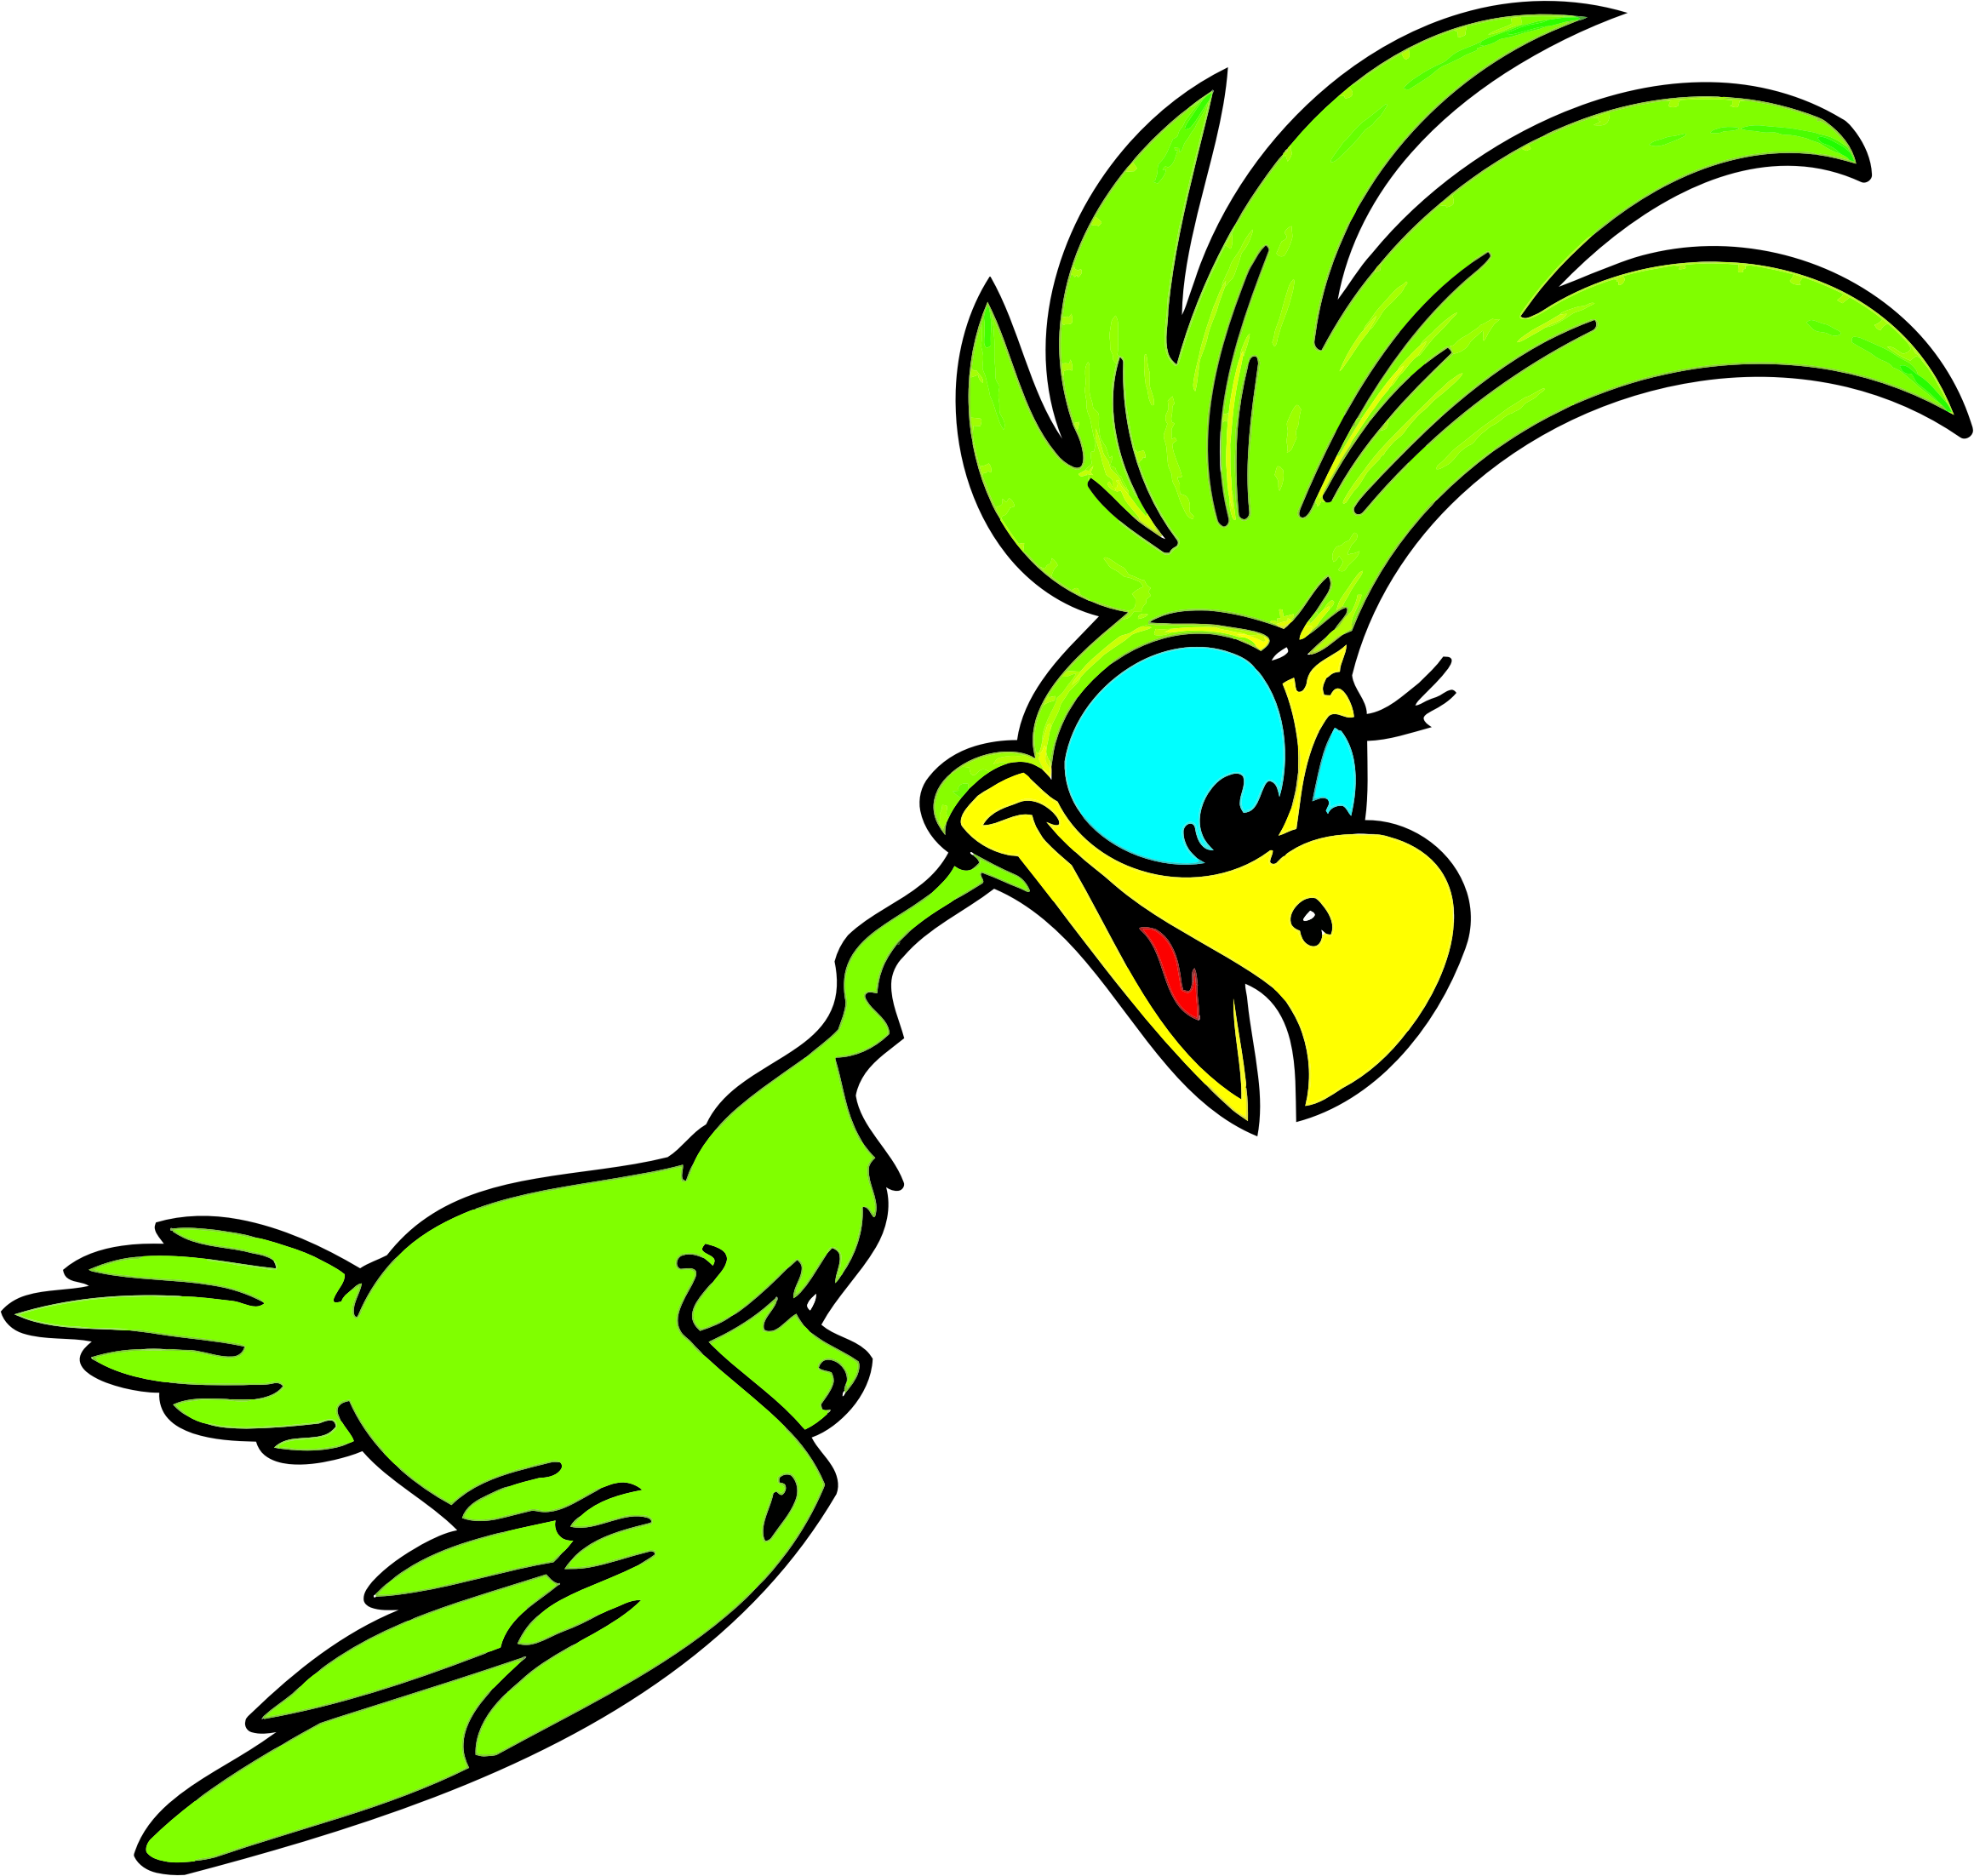 Green cartoon big image. Parrot clipart palm tree